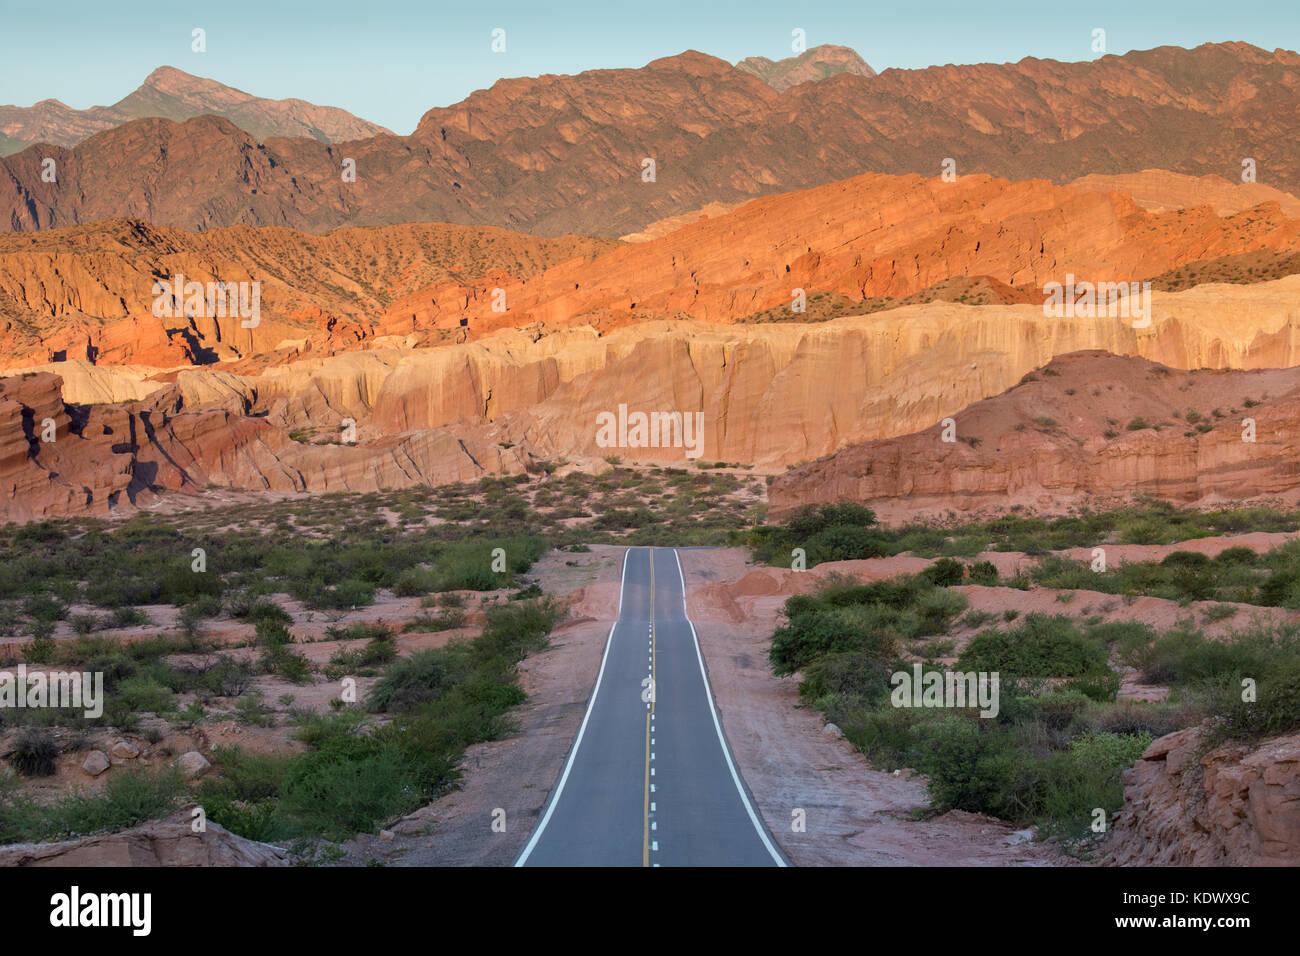 El camino por la Quebrada de la caracolas, Valles Calchaquíes, Provincia de Salta, Argentina Valles Calchaquíes, Imagen De Stock